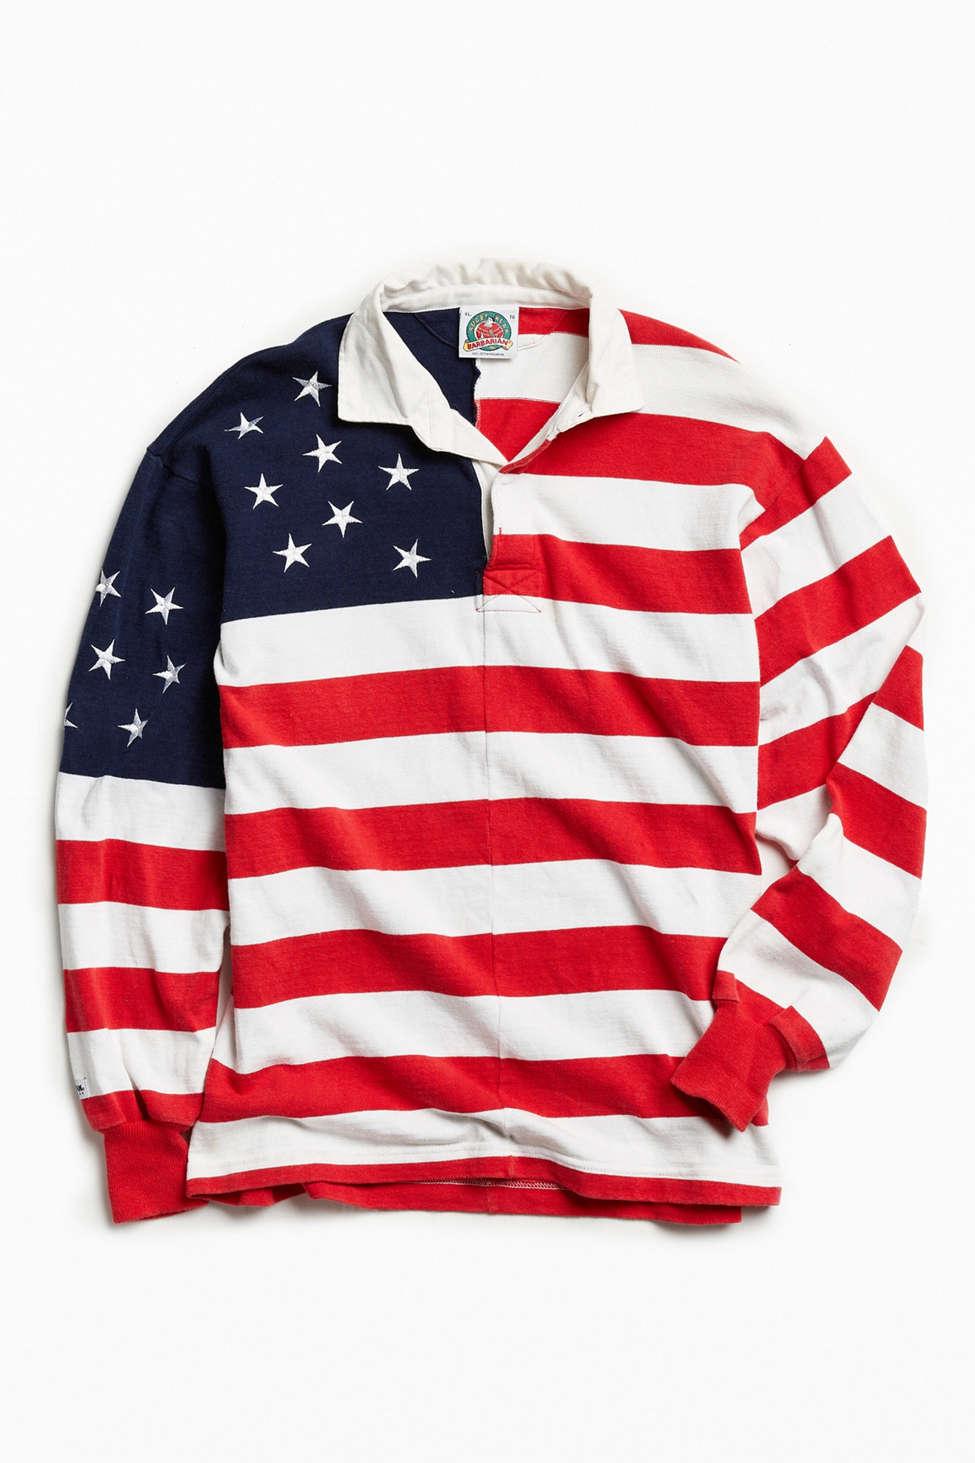 Slide View: 1: Vintage American Flag Rugby Shirt